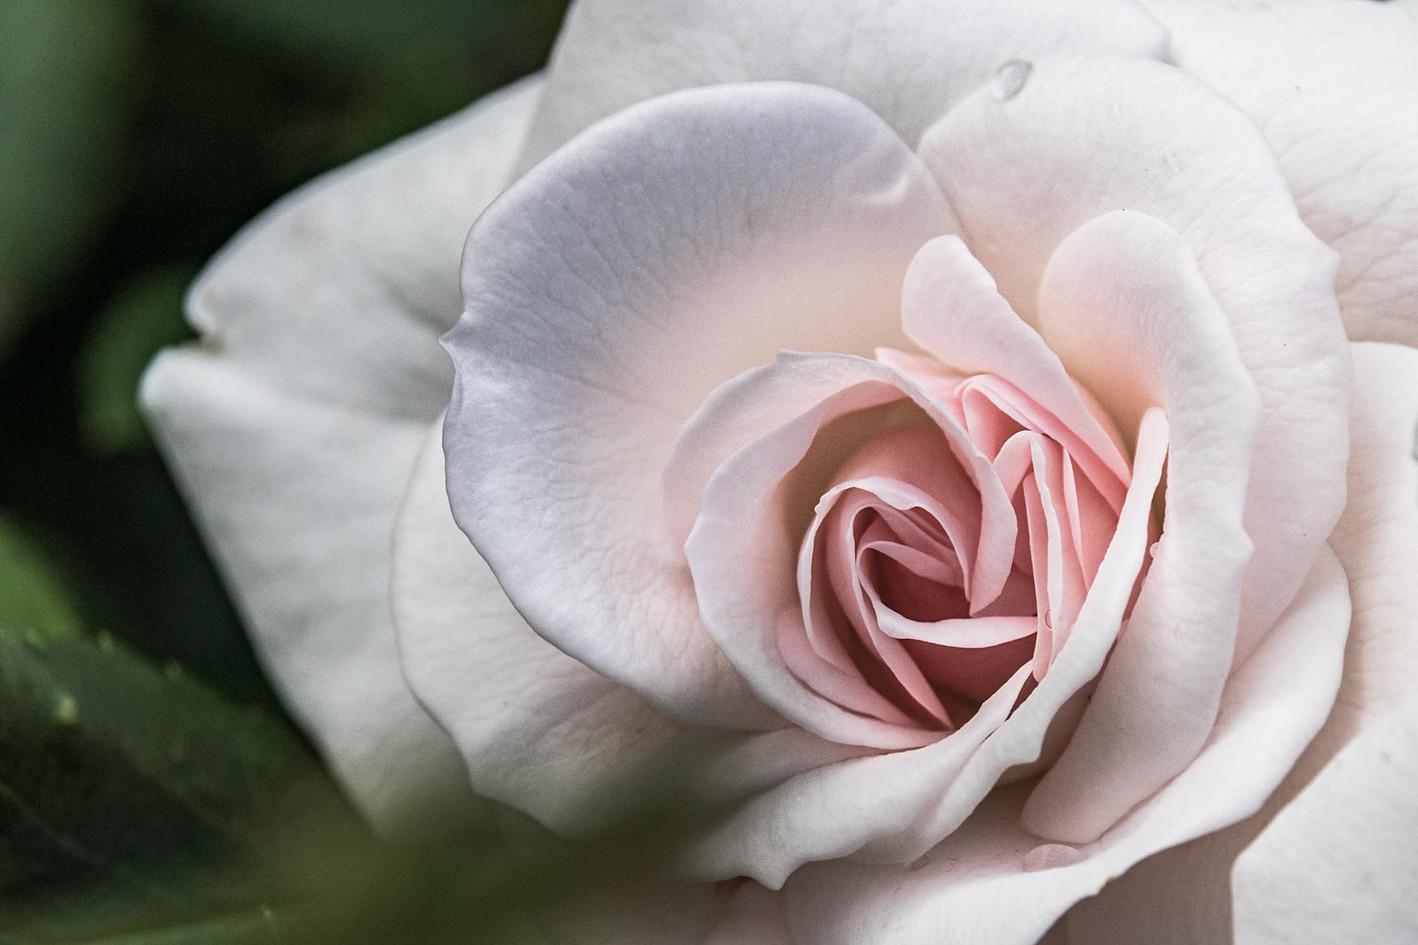 weiss pinke Rosenbluete Nahaufnahme detailaufnahme